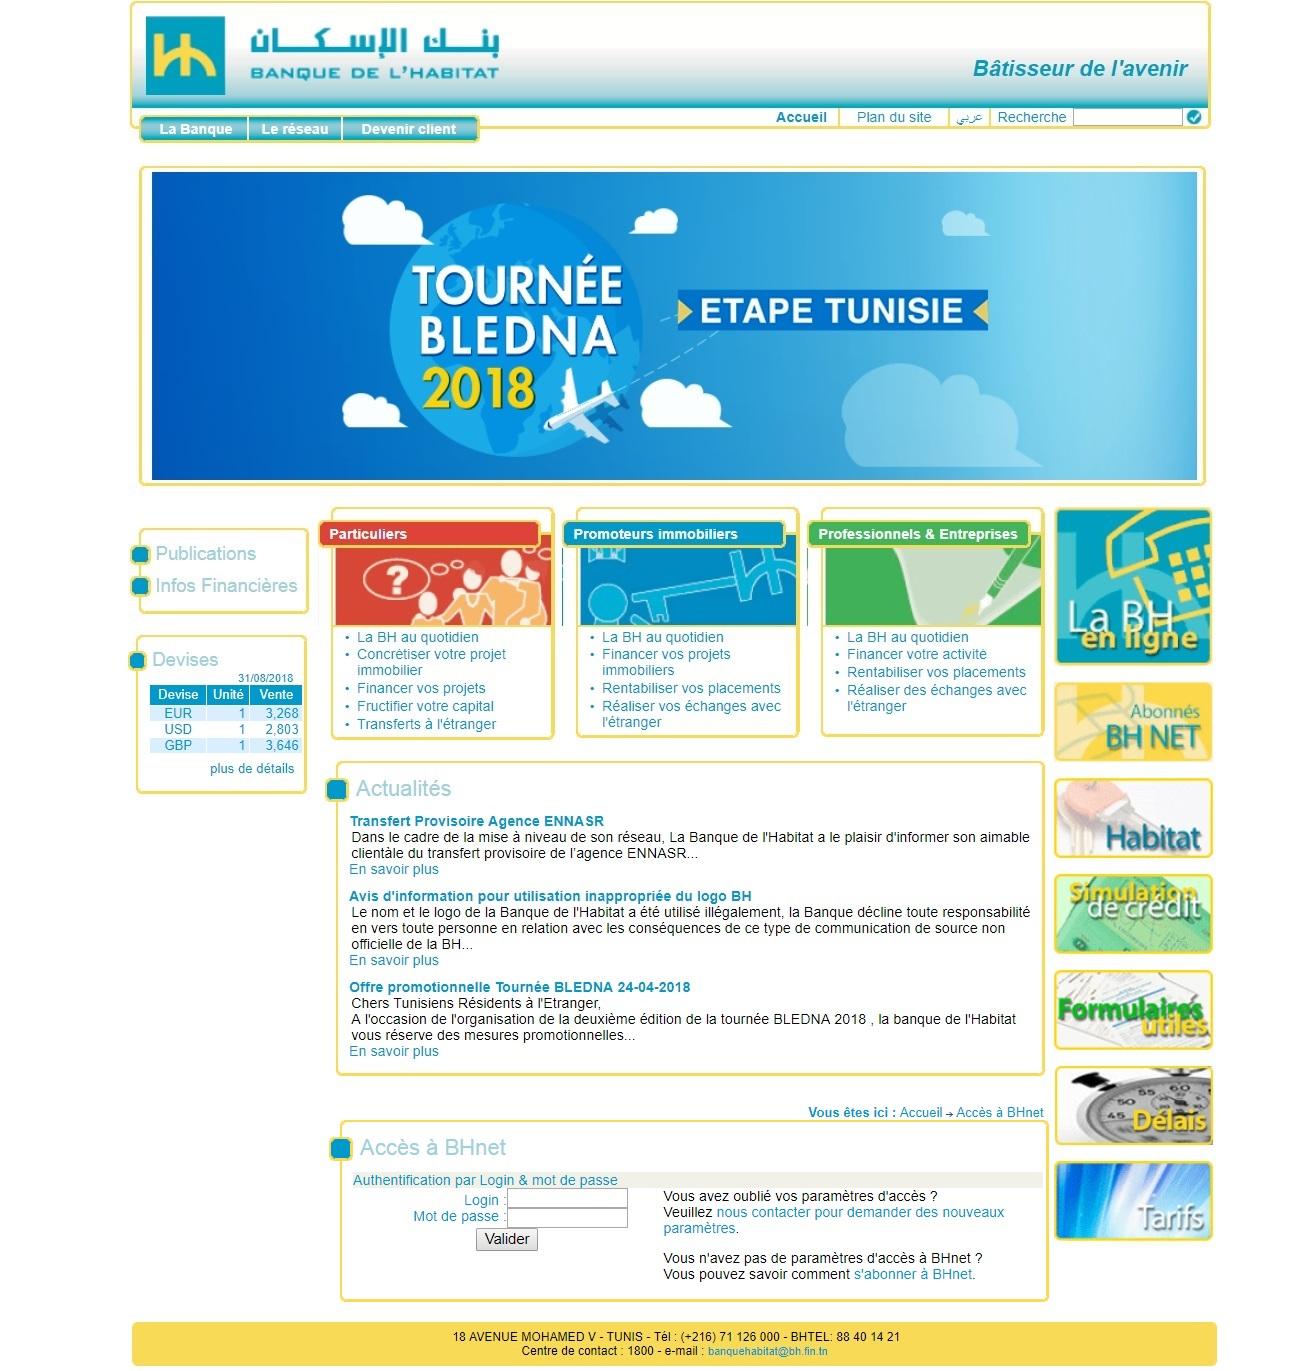 bh.com.tn BhNet Banque de l'Habitat de Tunisie BH بنك الاسكان تونس